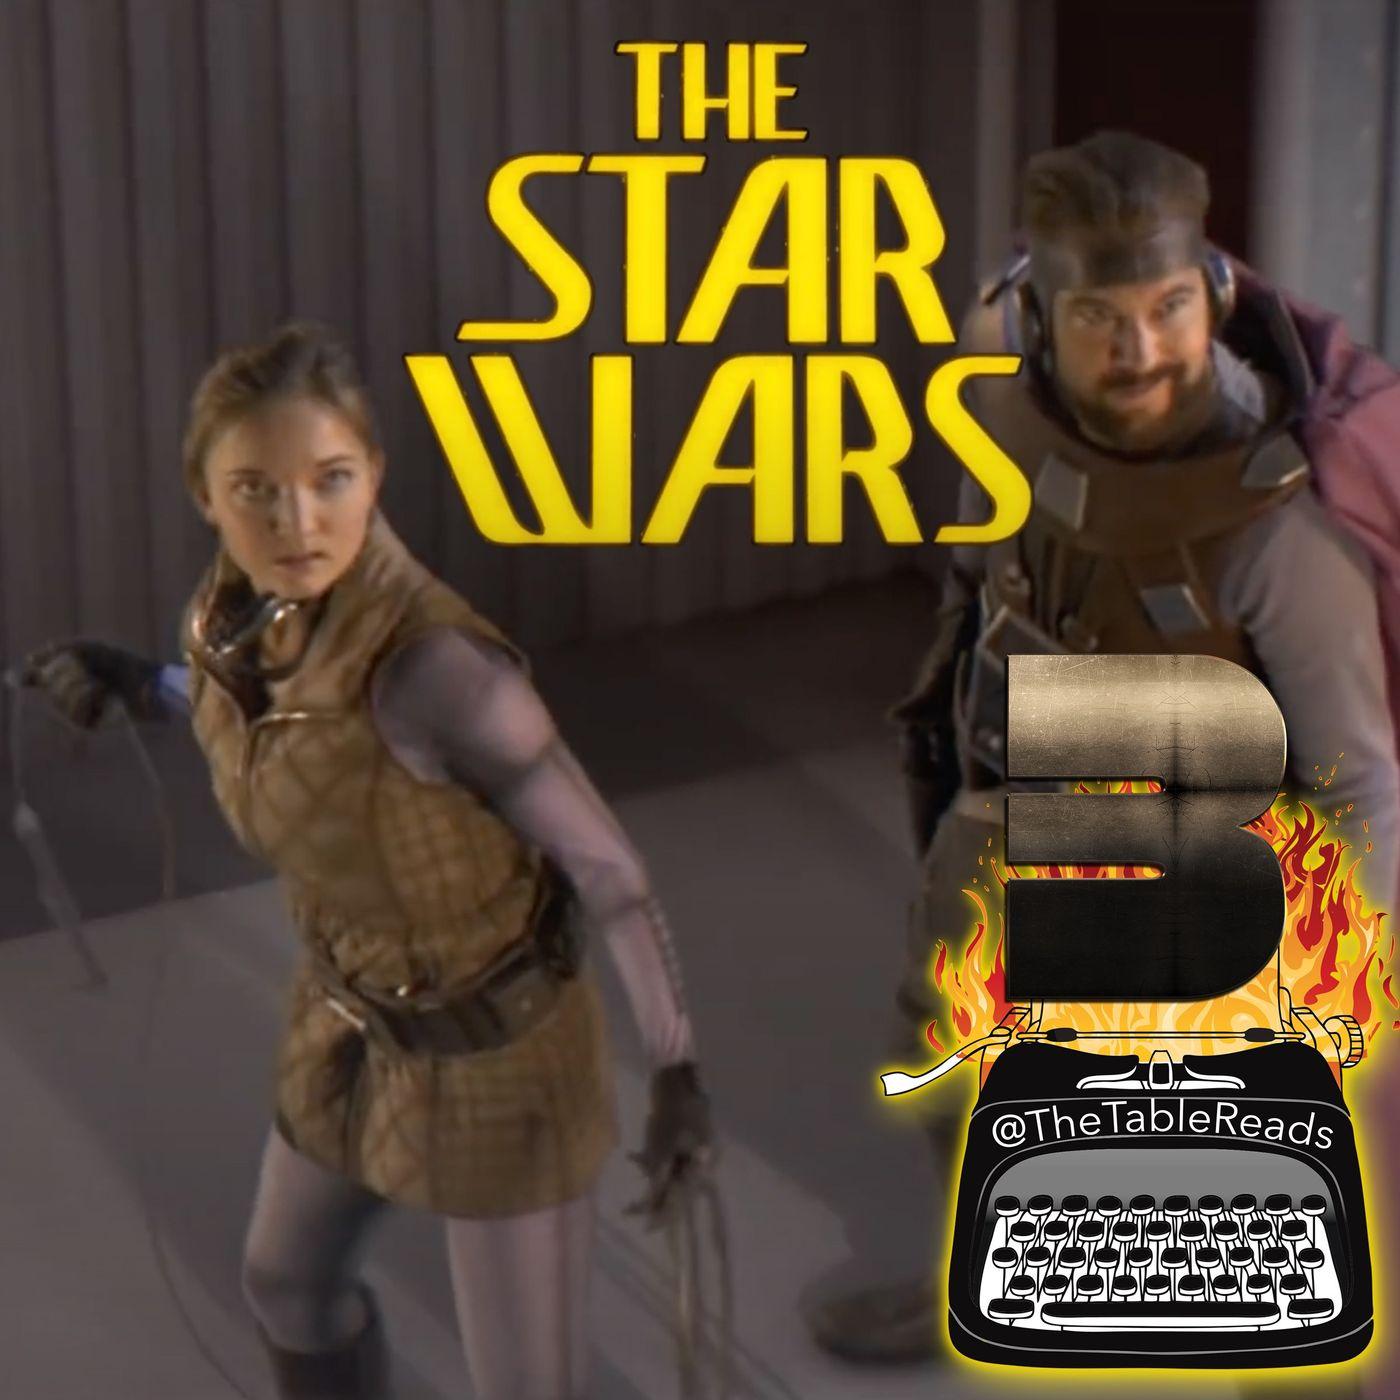 125 - The Star Wars, Part 3